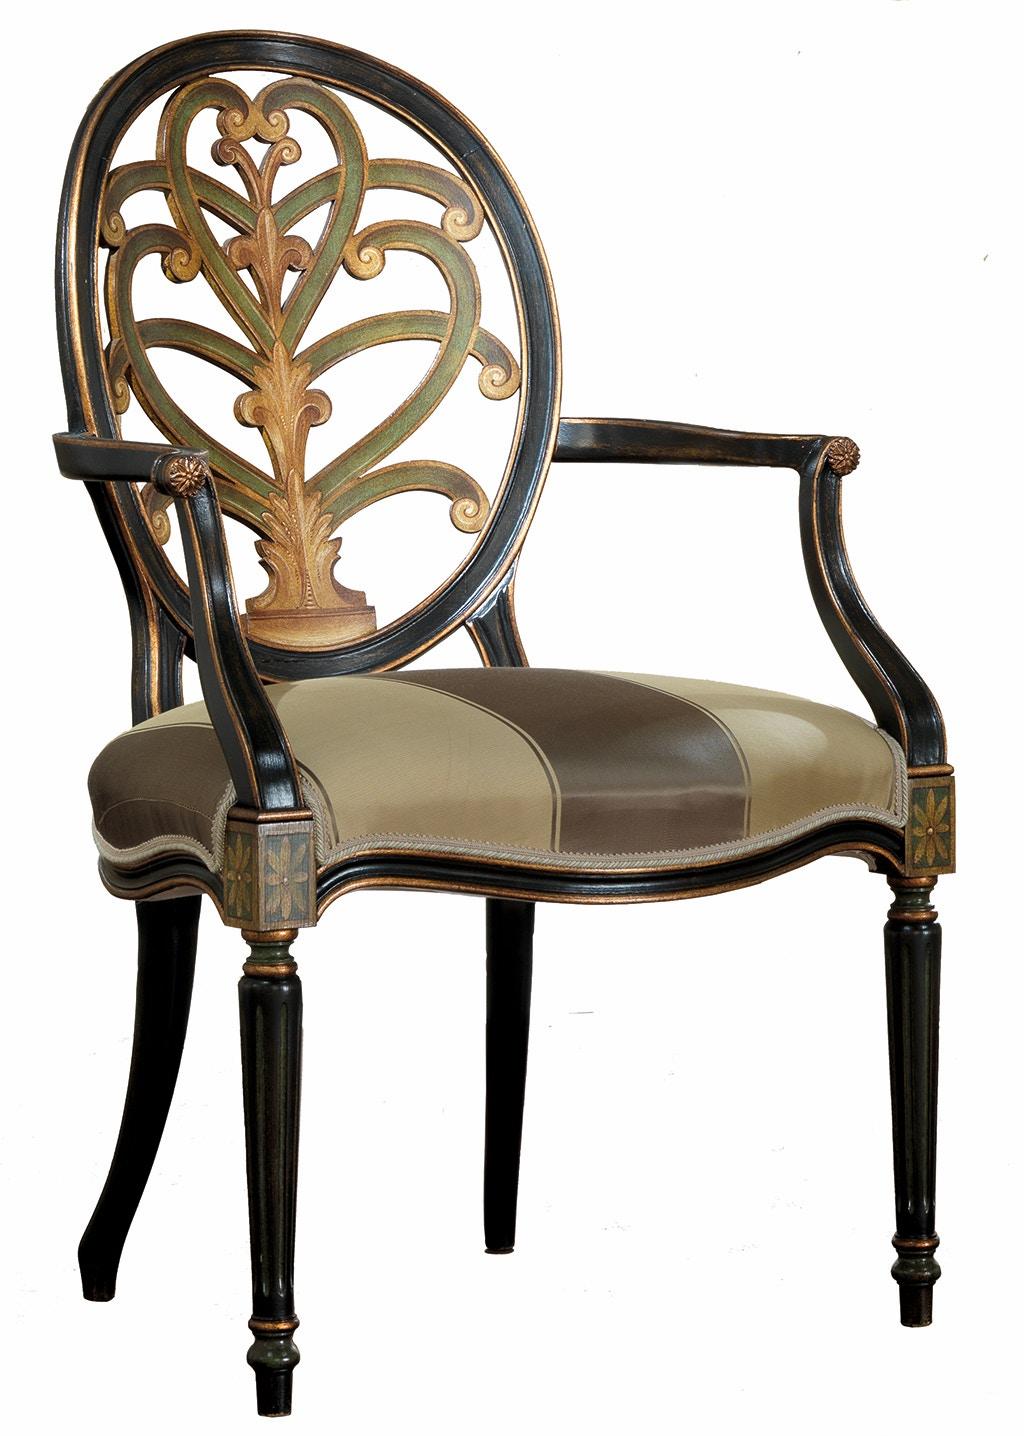 Von Hemert Interiors Italian Imports Mfr: XI29 Arm Chair #1544 P